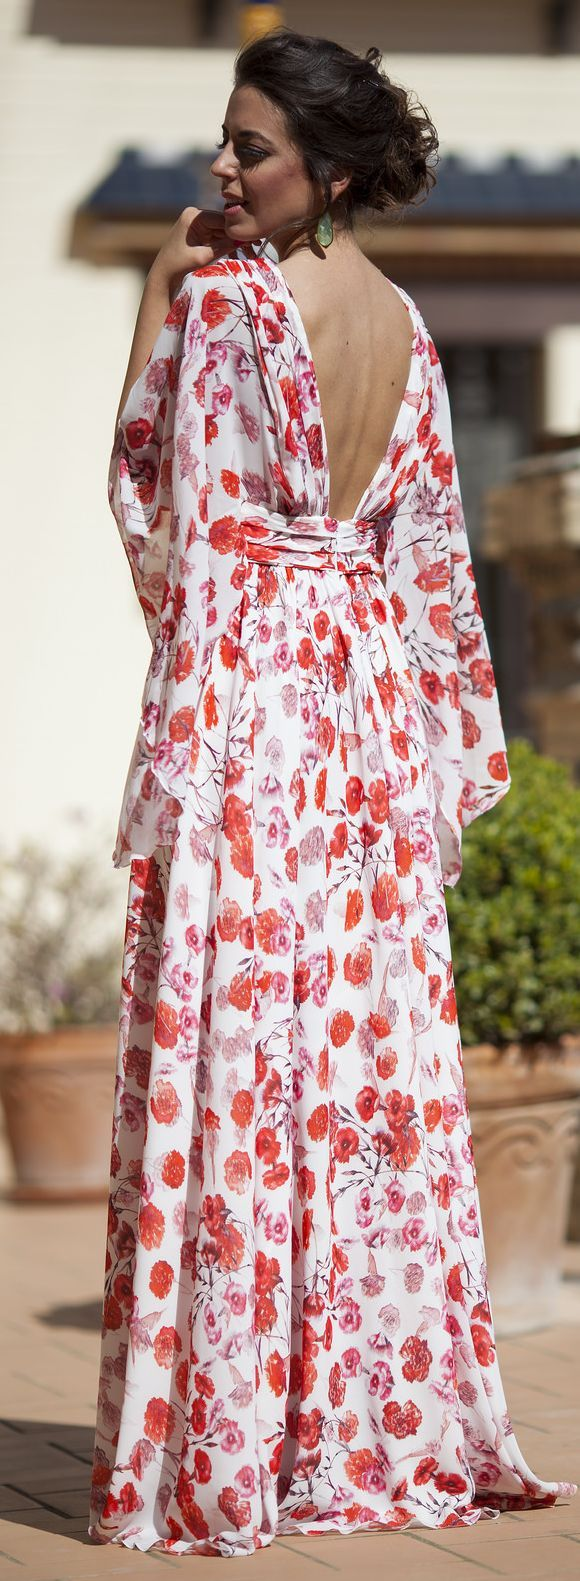 Silvia Navarro Poppy Print Cocktail New Collection Maxi Dress by ...